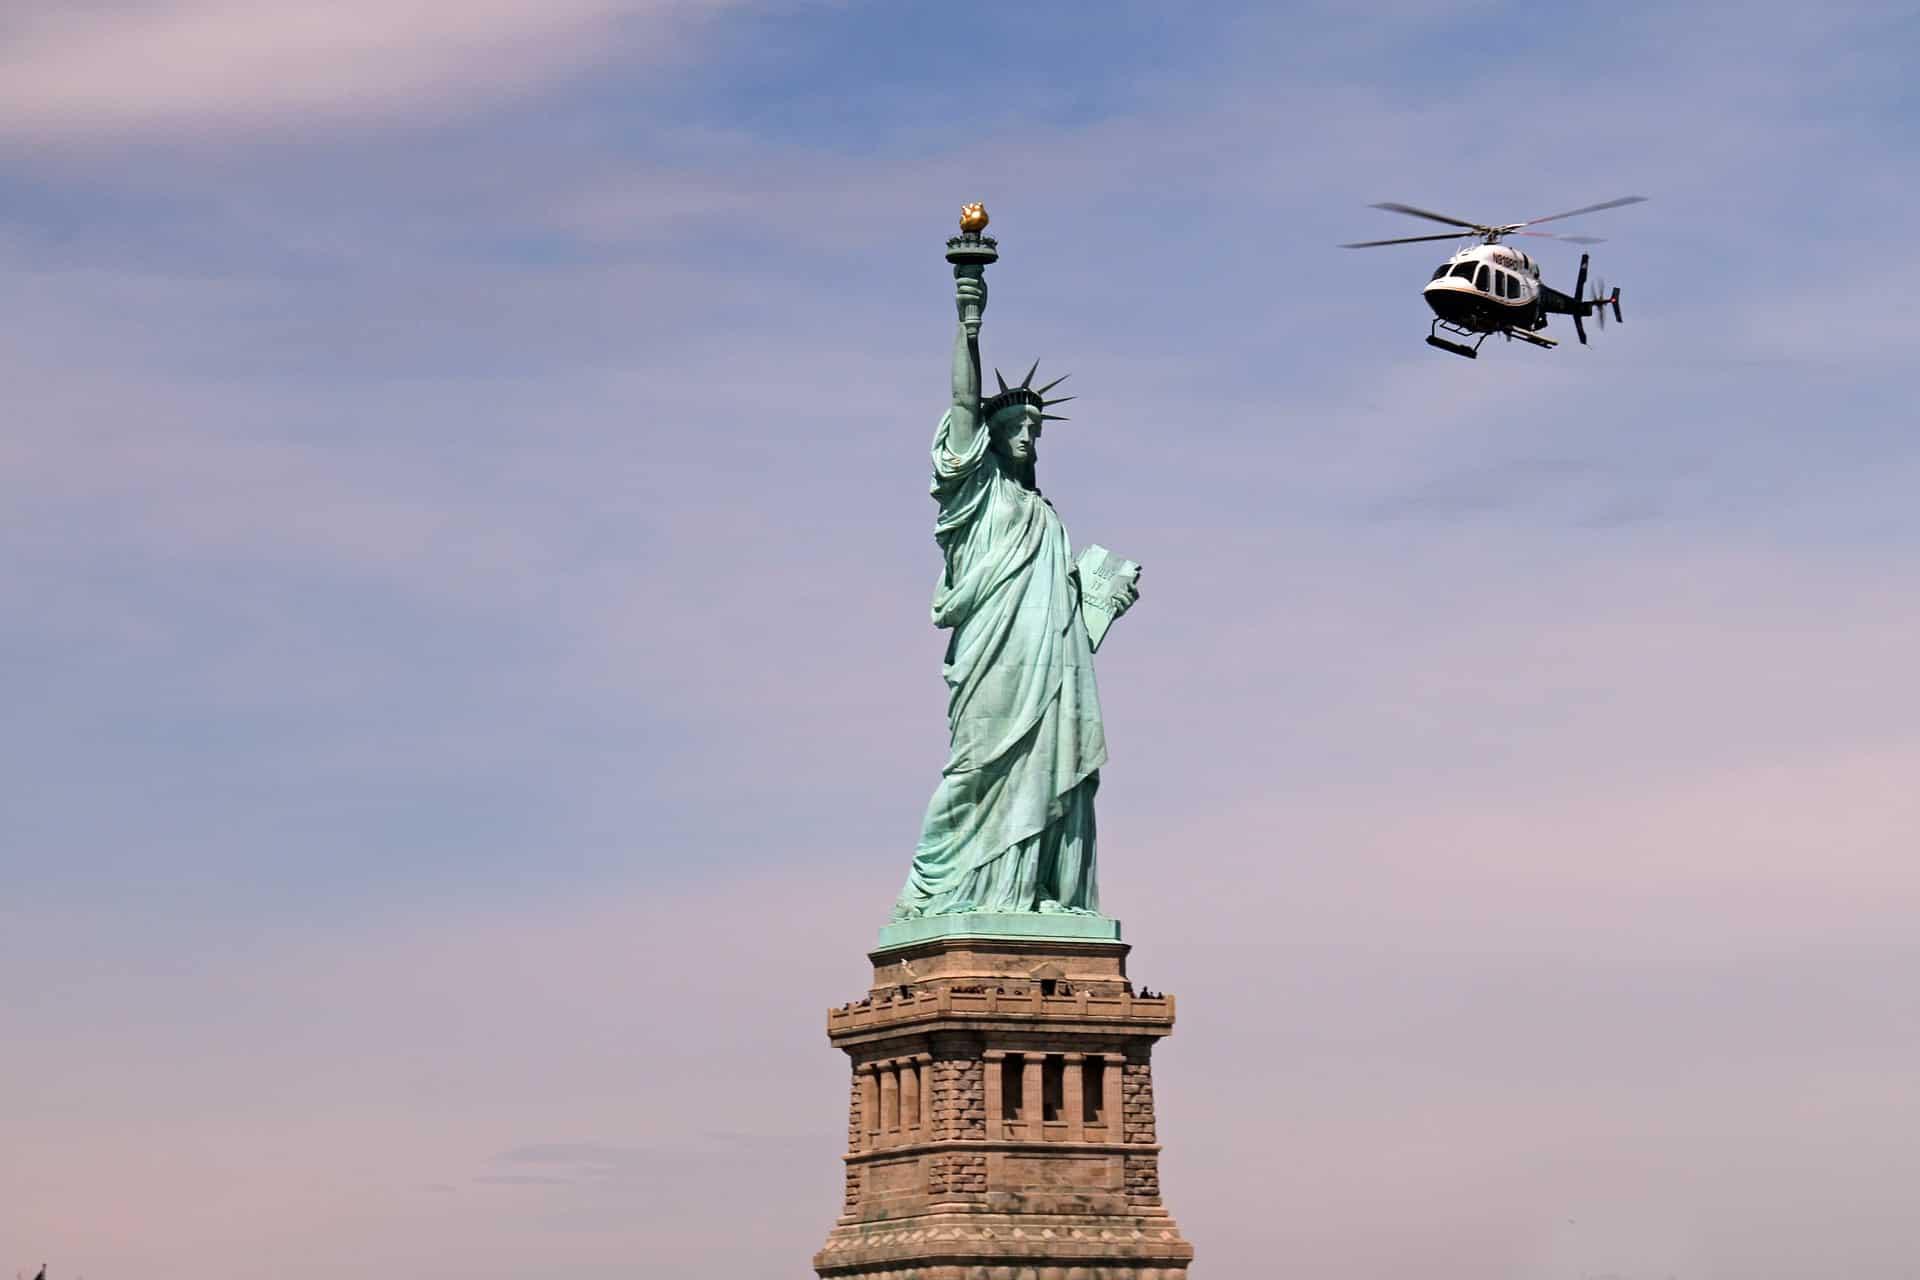 Helikopterflug Freiheitsstatue